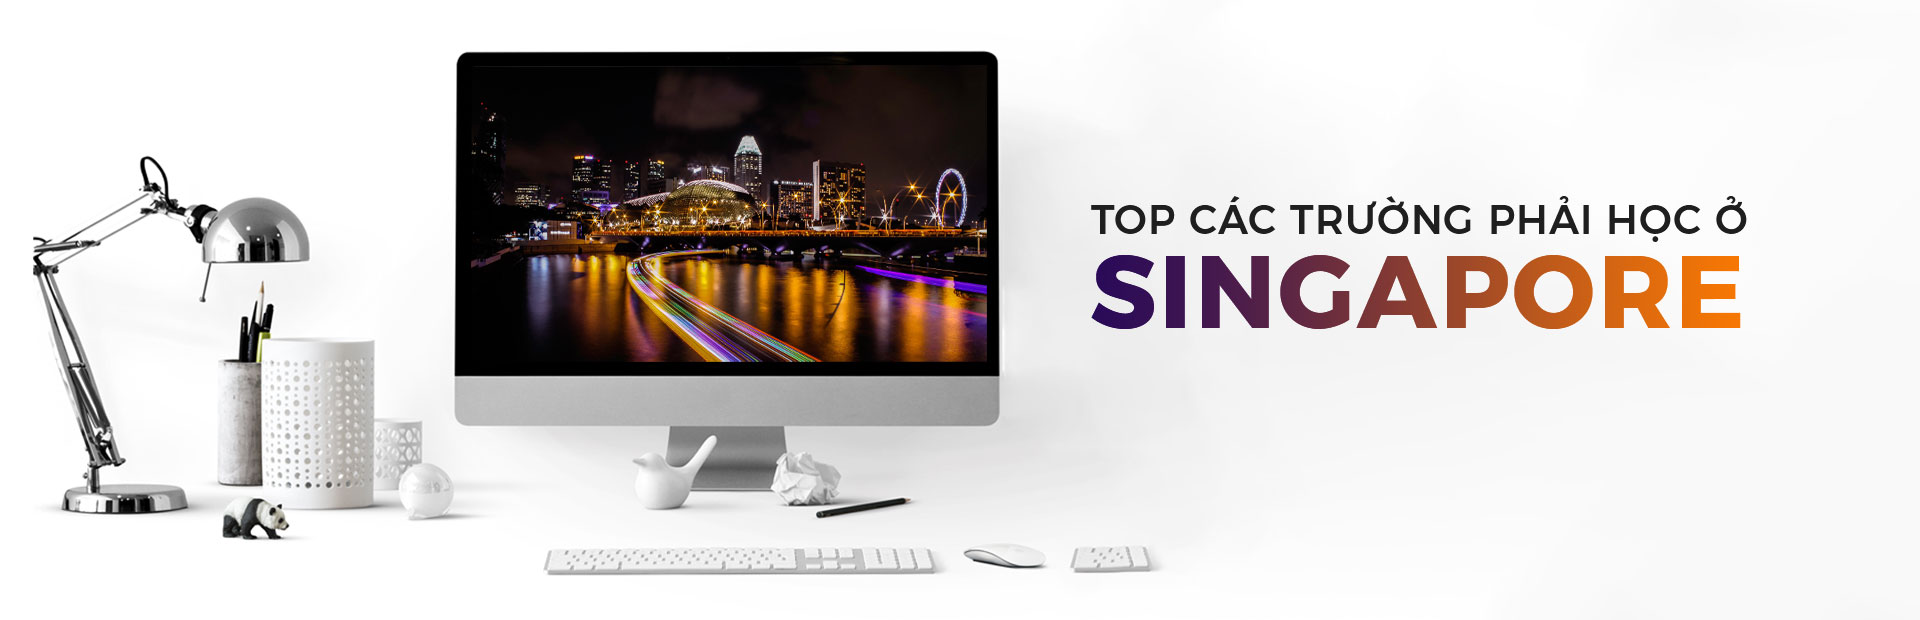 Singapore Truong